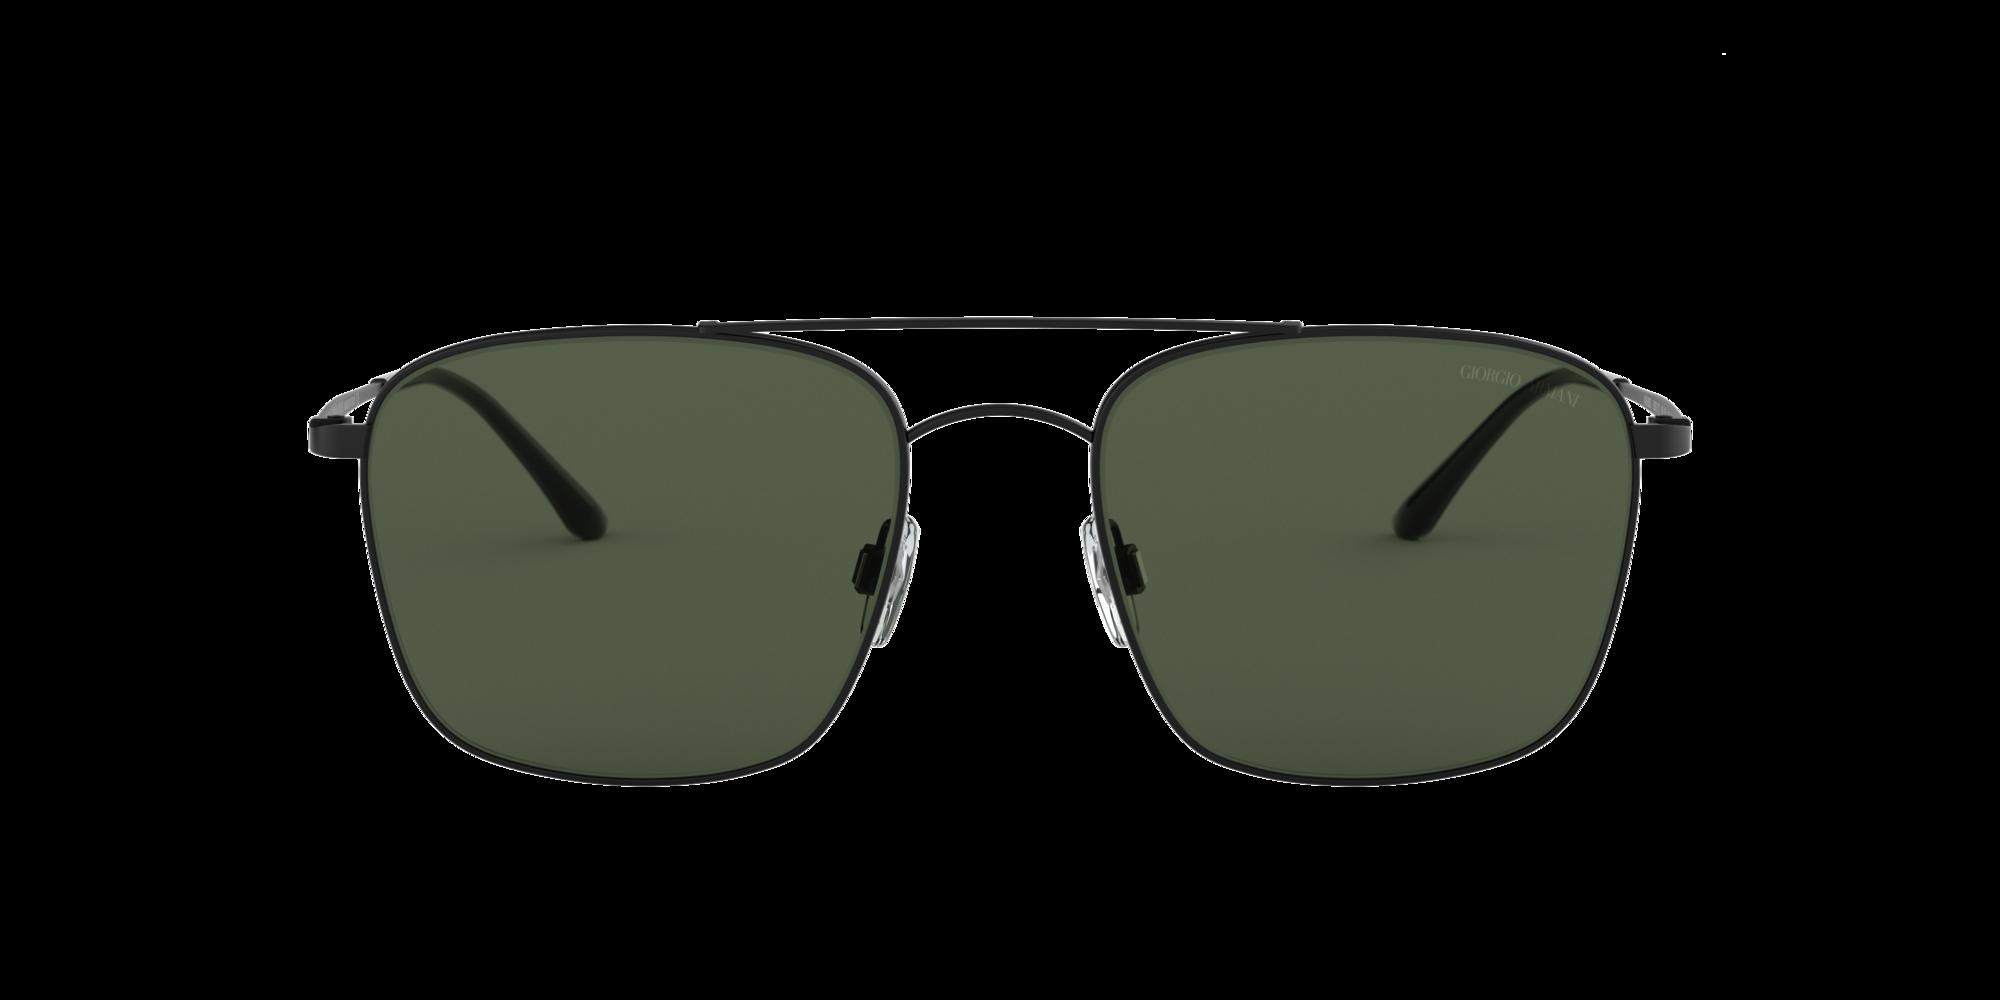 Image for AR6080 55 from LensCrafters | Glasses, Prescription Glasses Online, Eyewear